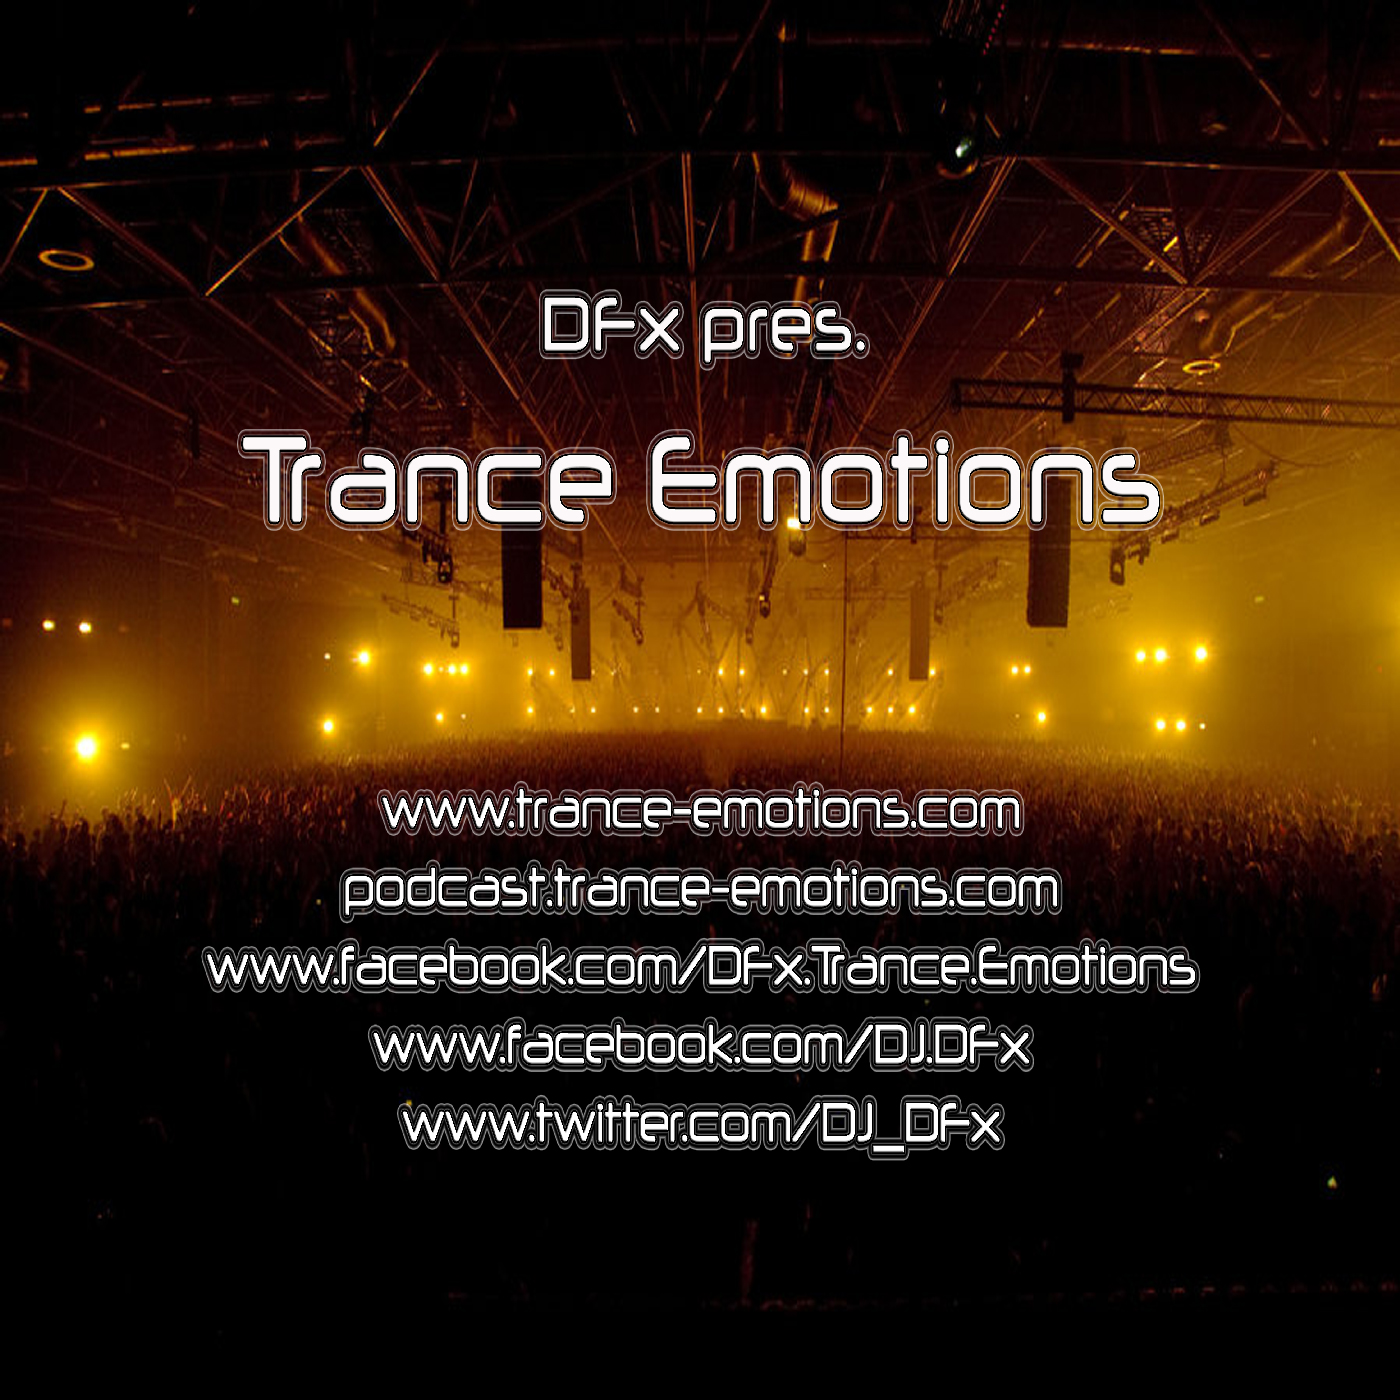 DFx pres. Trance Emotions